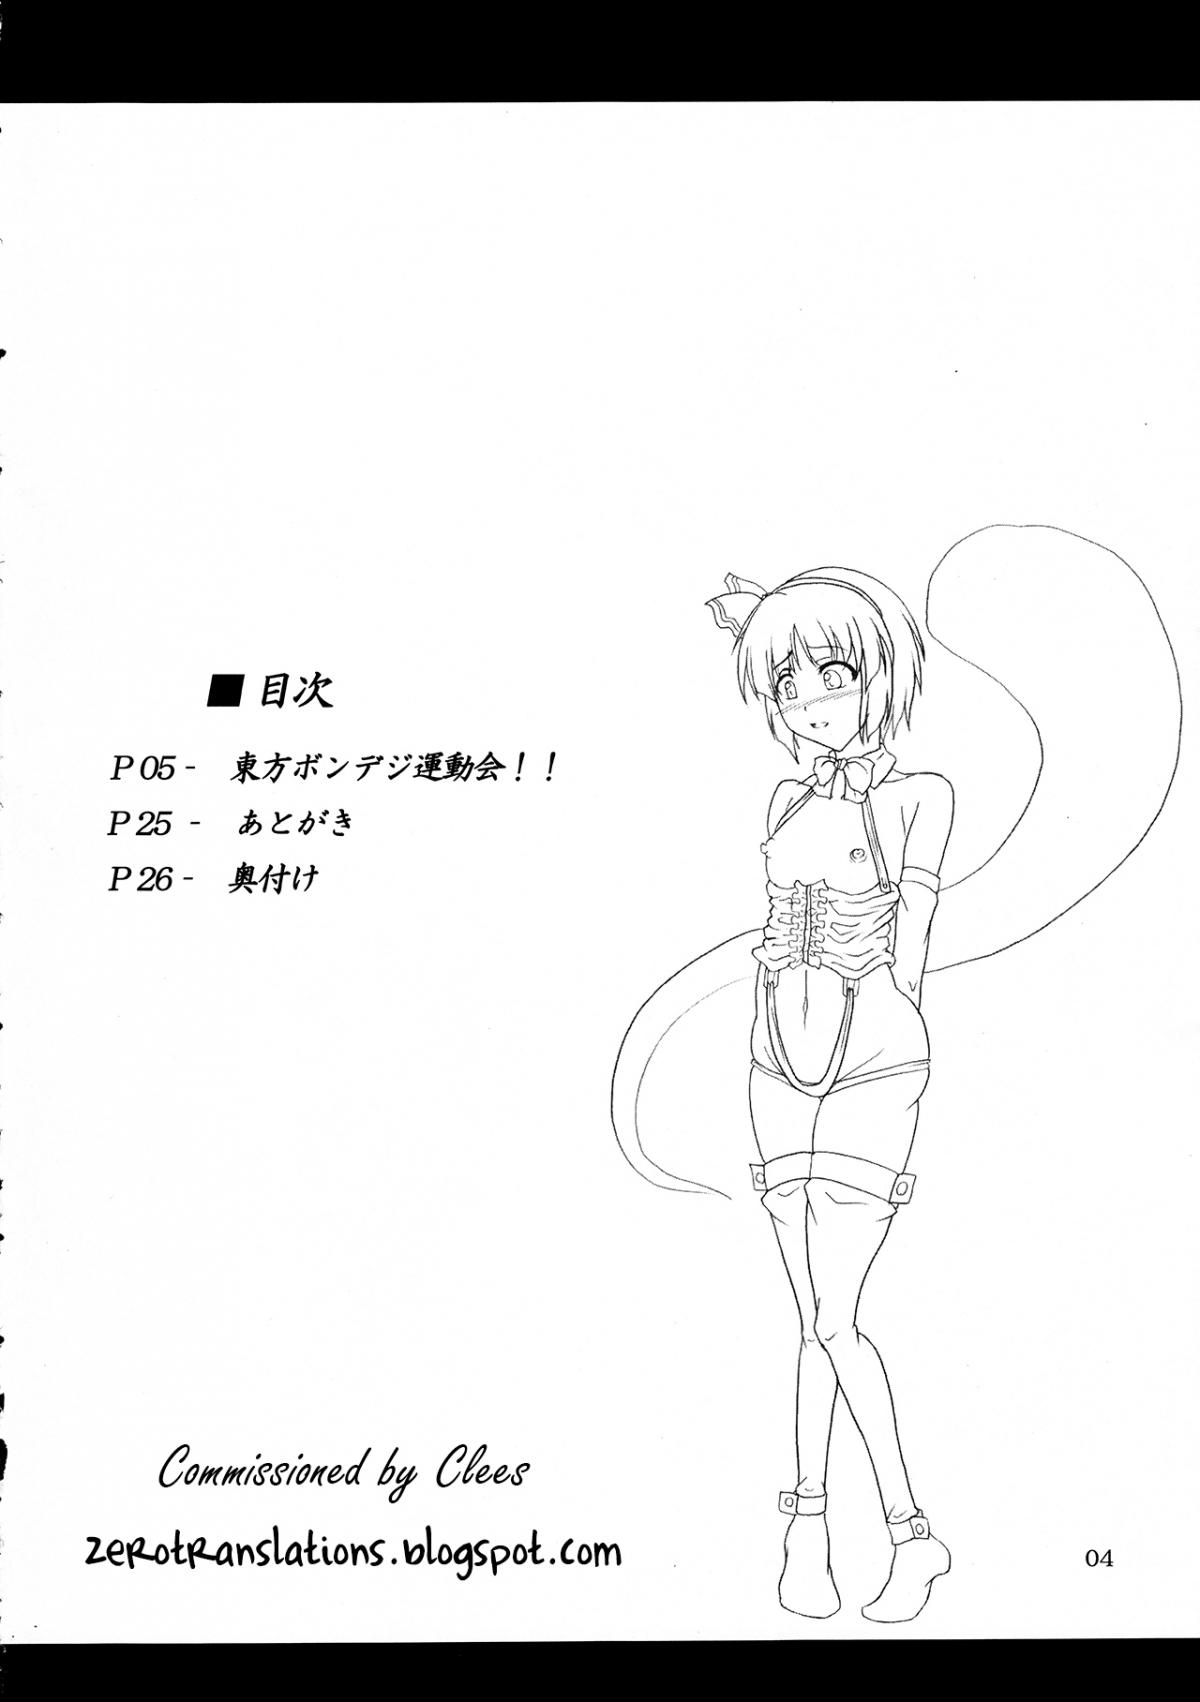 Hình ảnh  trong bài viết Touhou Bondage Undoukai